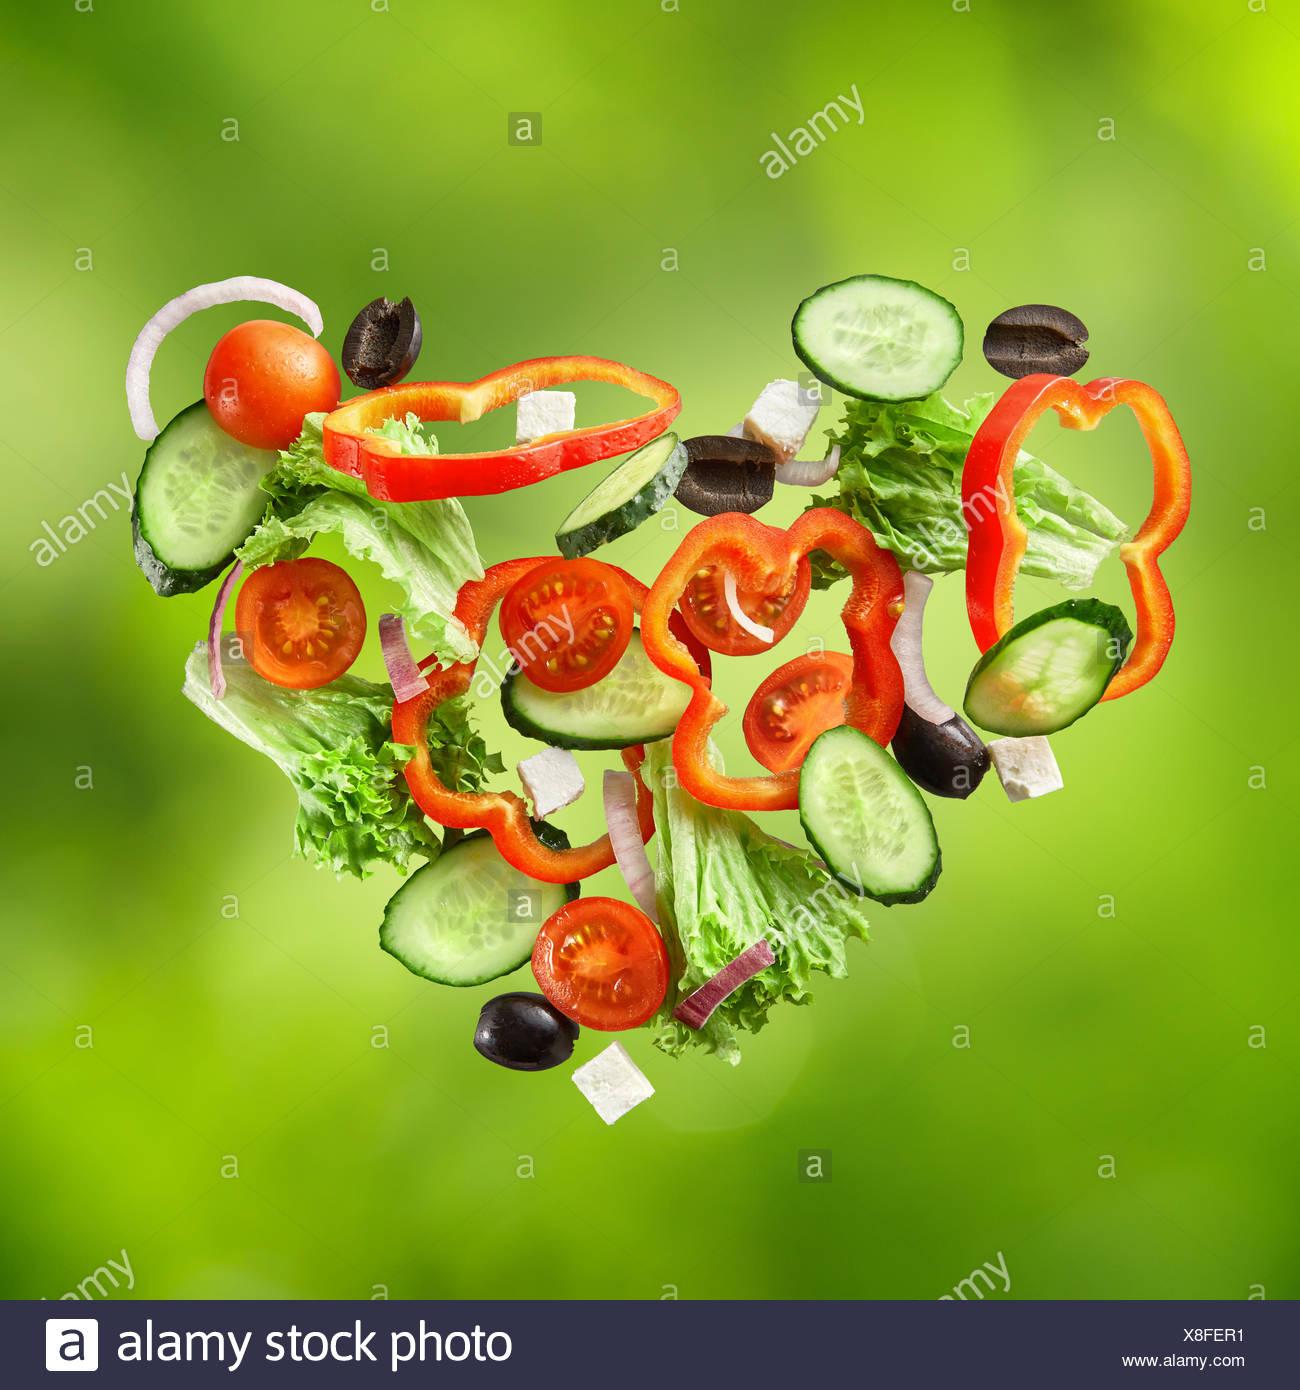 Salade de vol sur fond vert naturel Photo Stock